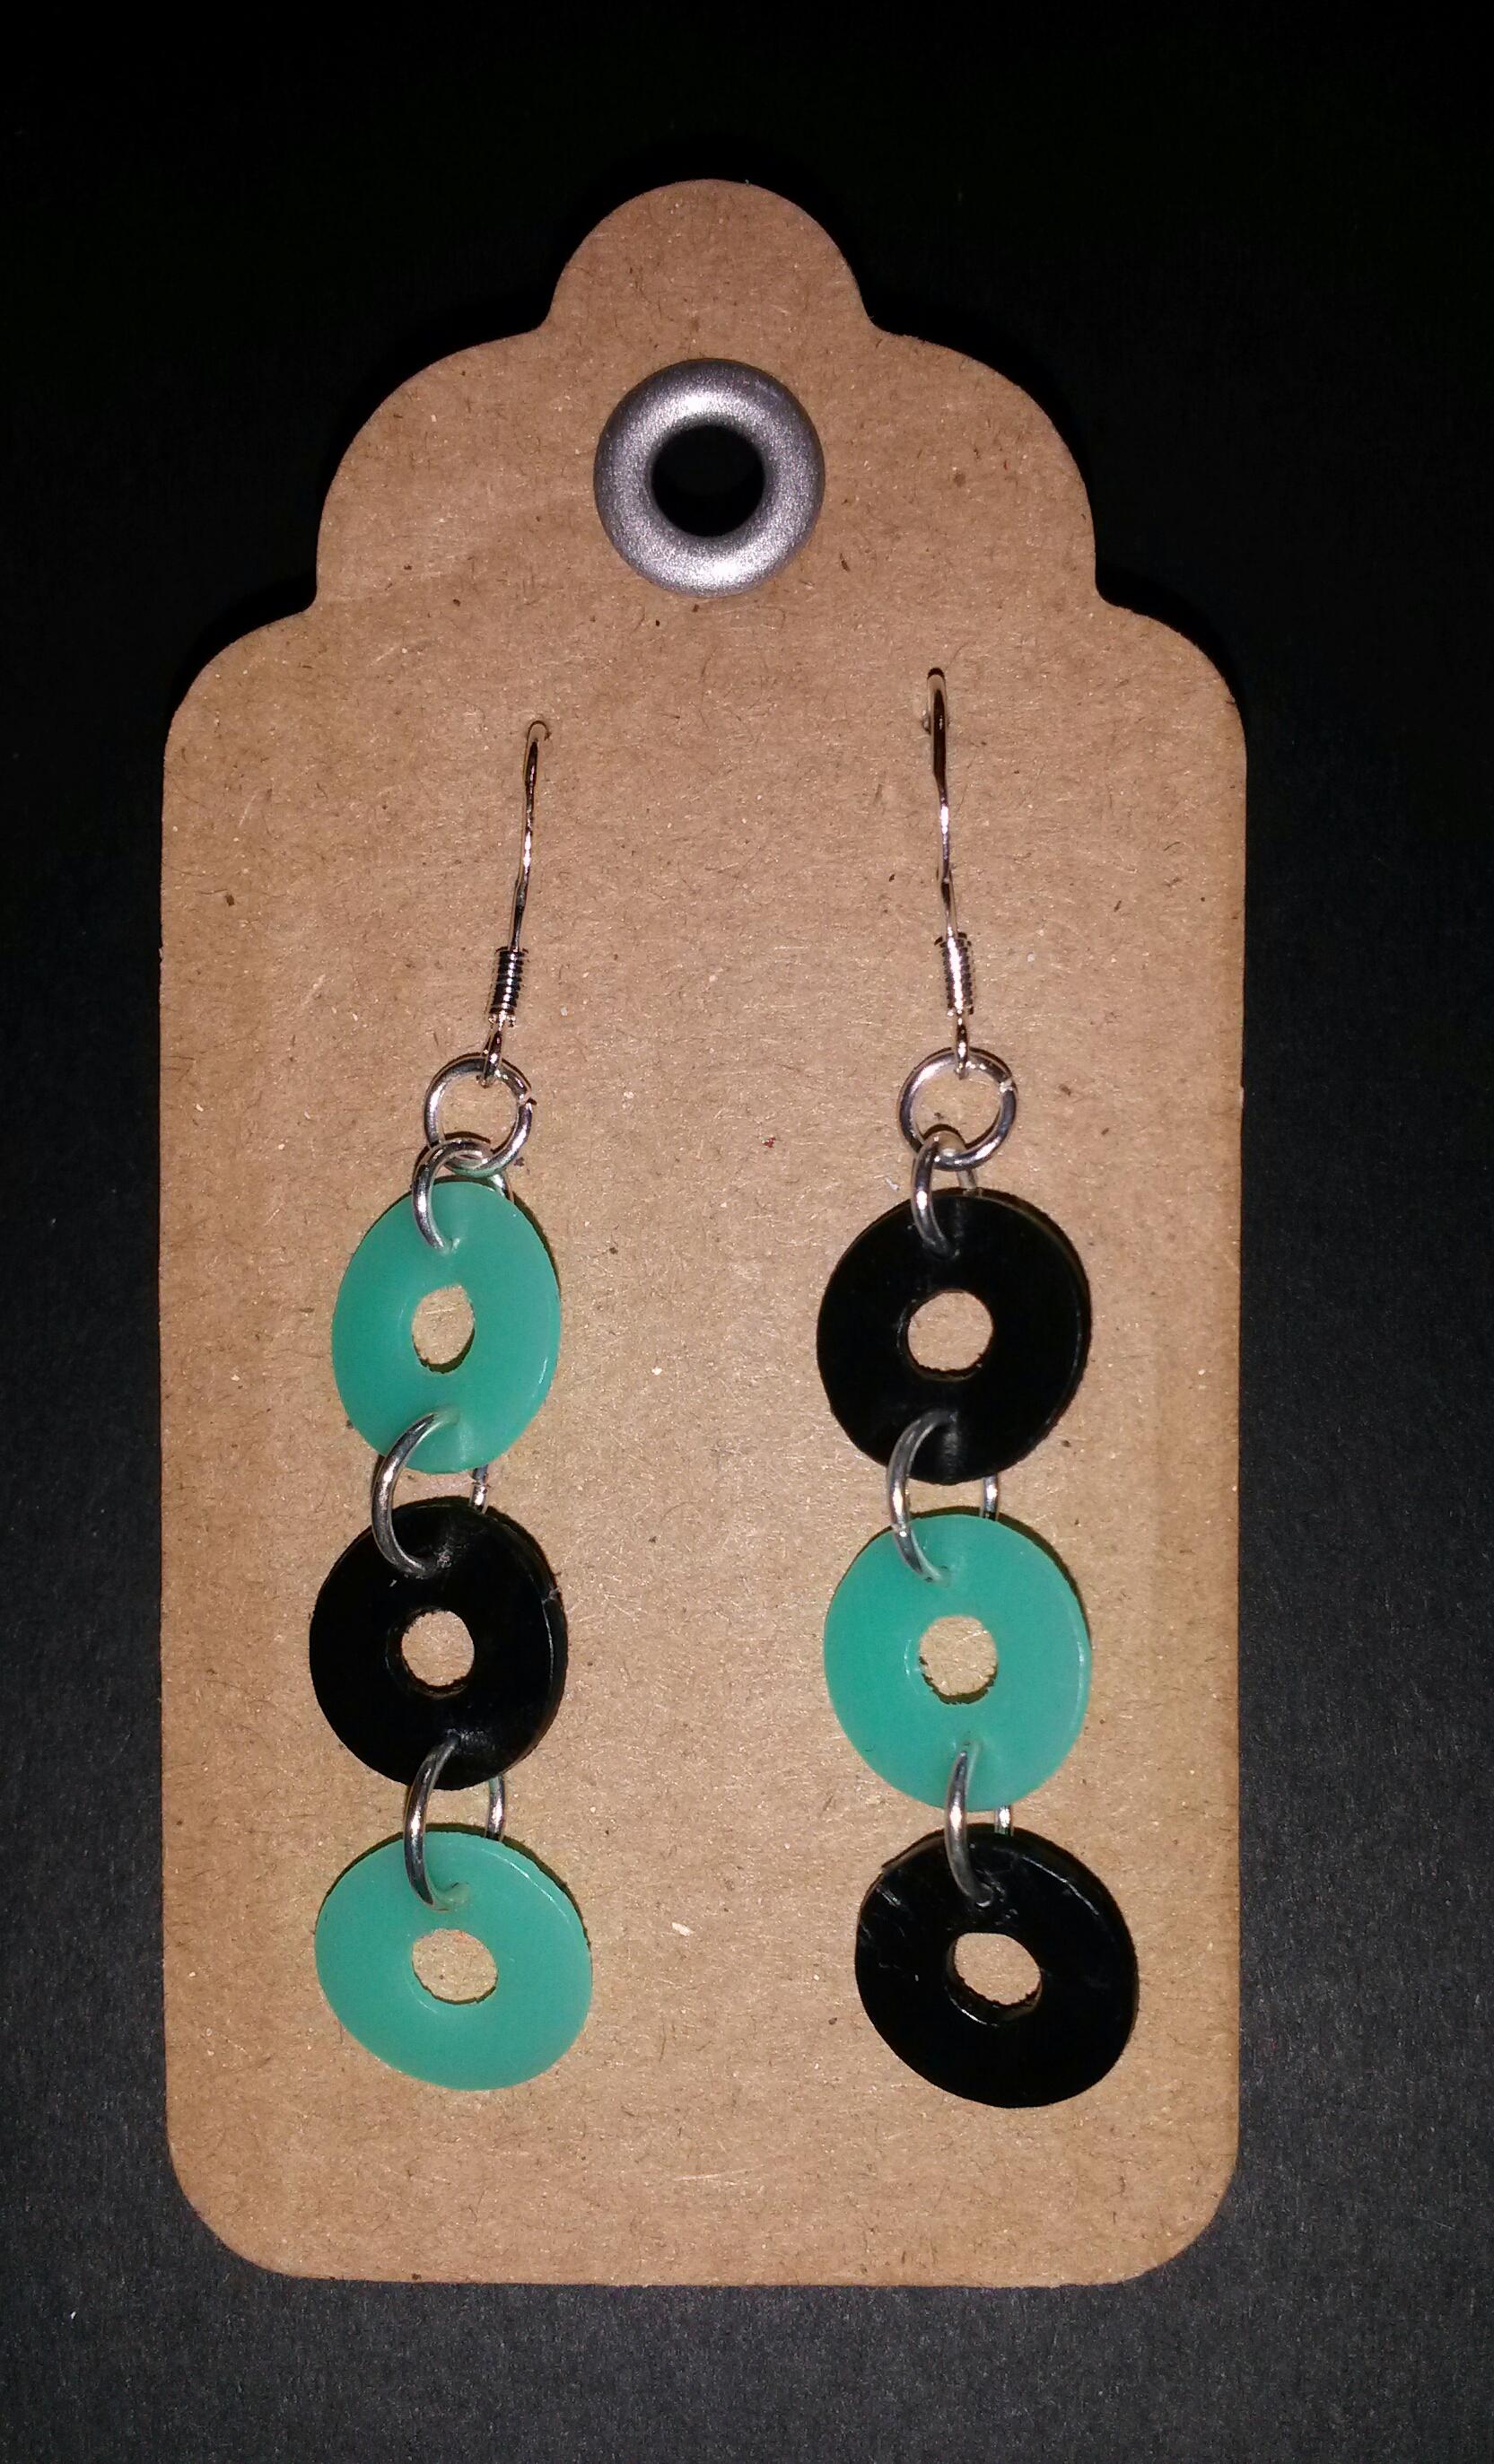 recycled plastic earrings 5